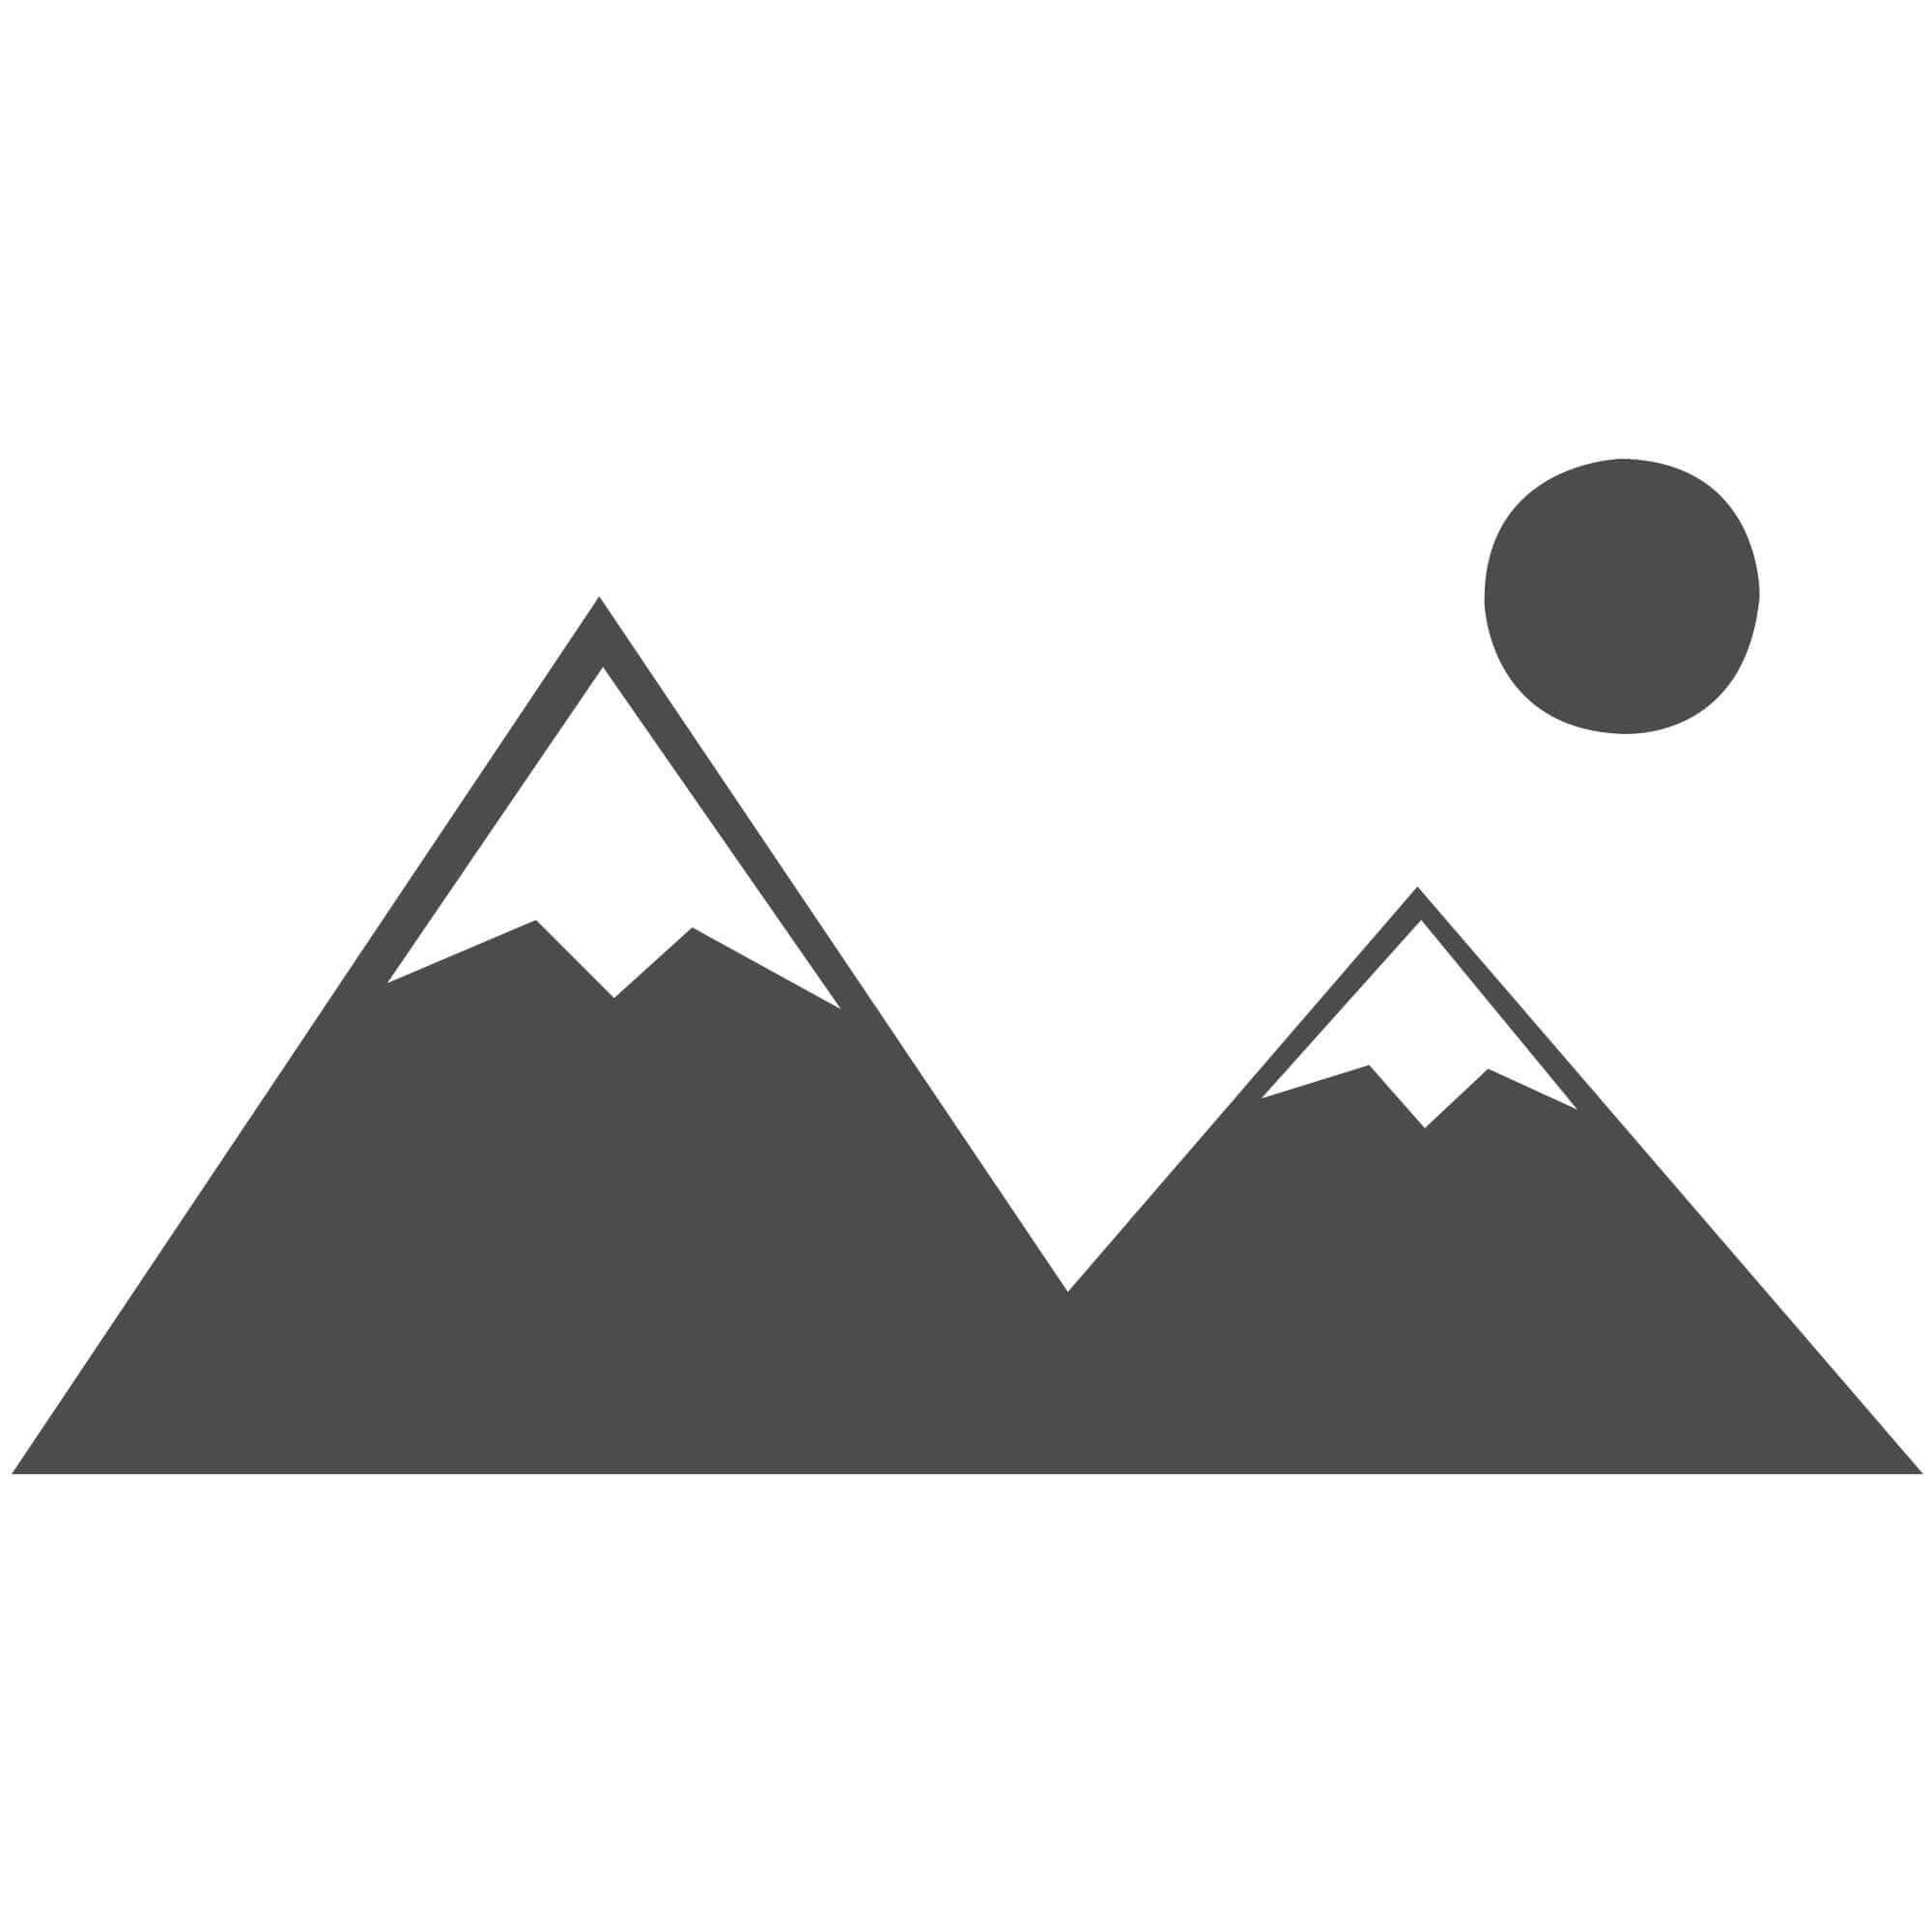 "Ottoman Temple Rug - Grey - Size 120 x 170 cm (4' x 5'7"")"